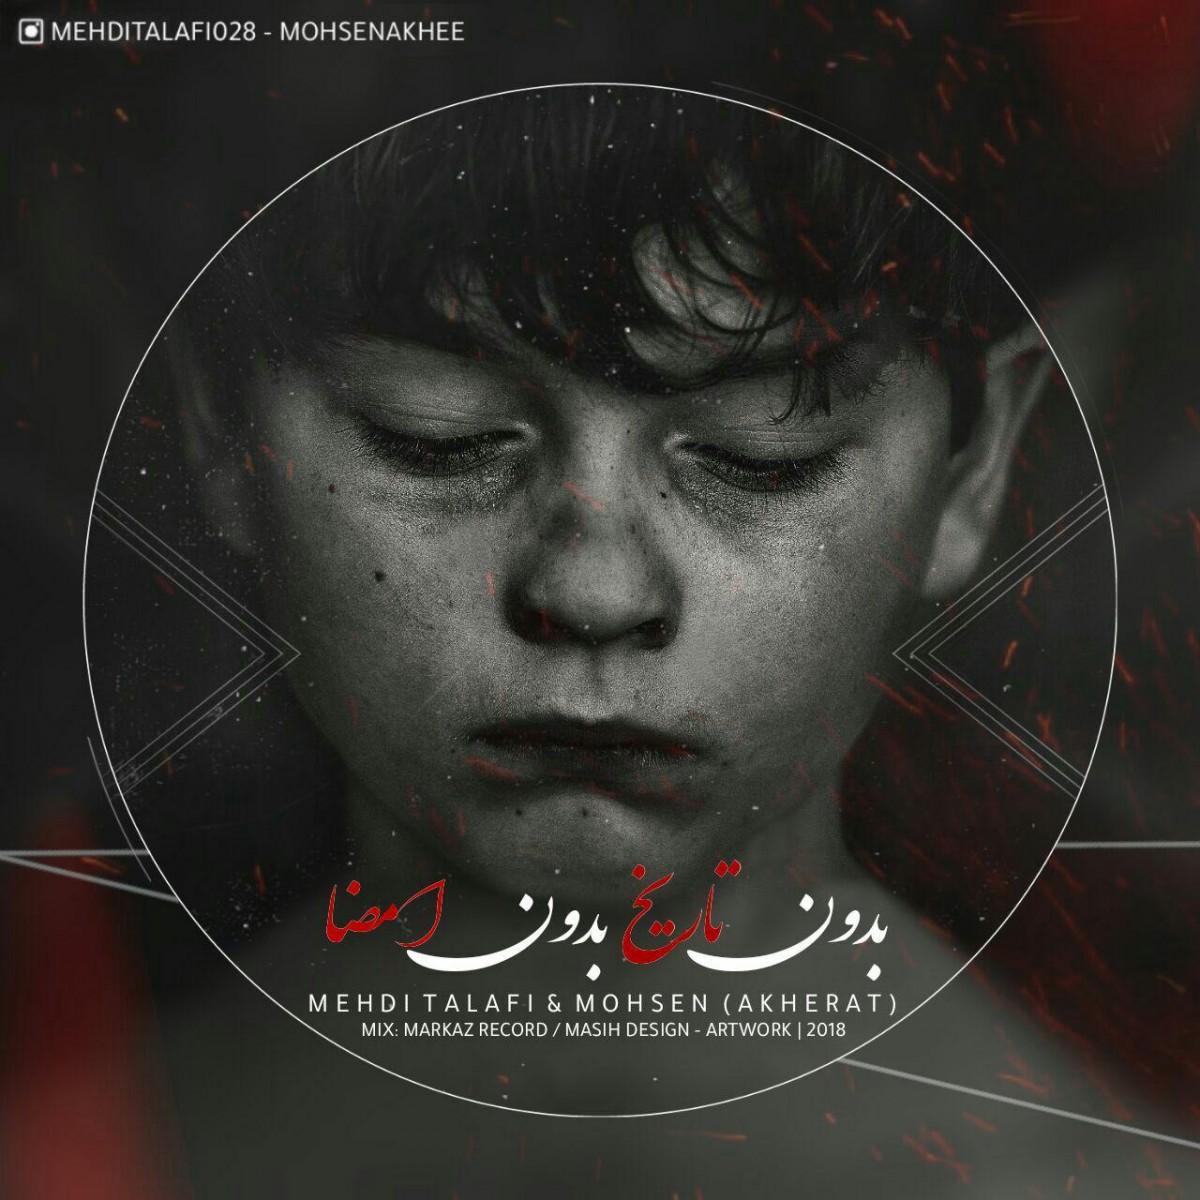 نامبر وان موزیک | دانلود آهنگ جدید Mehdi-Talafi-Mohsen-Akhe-Bedone-Tarikh-Bedone-Emza